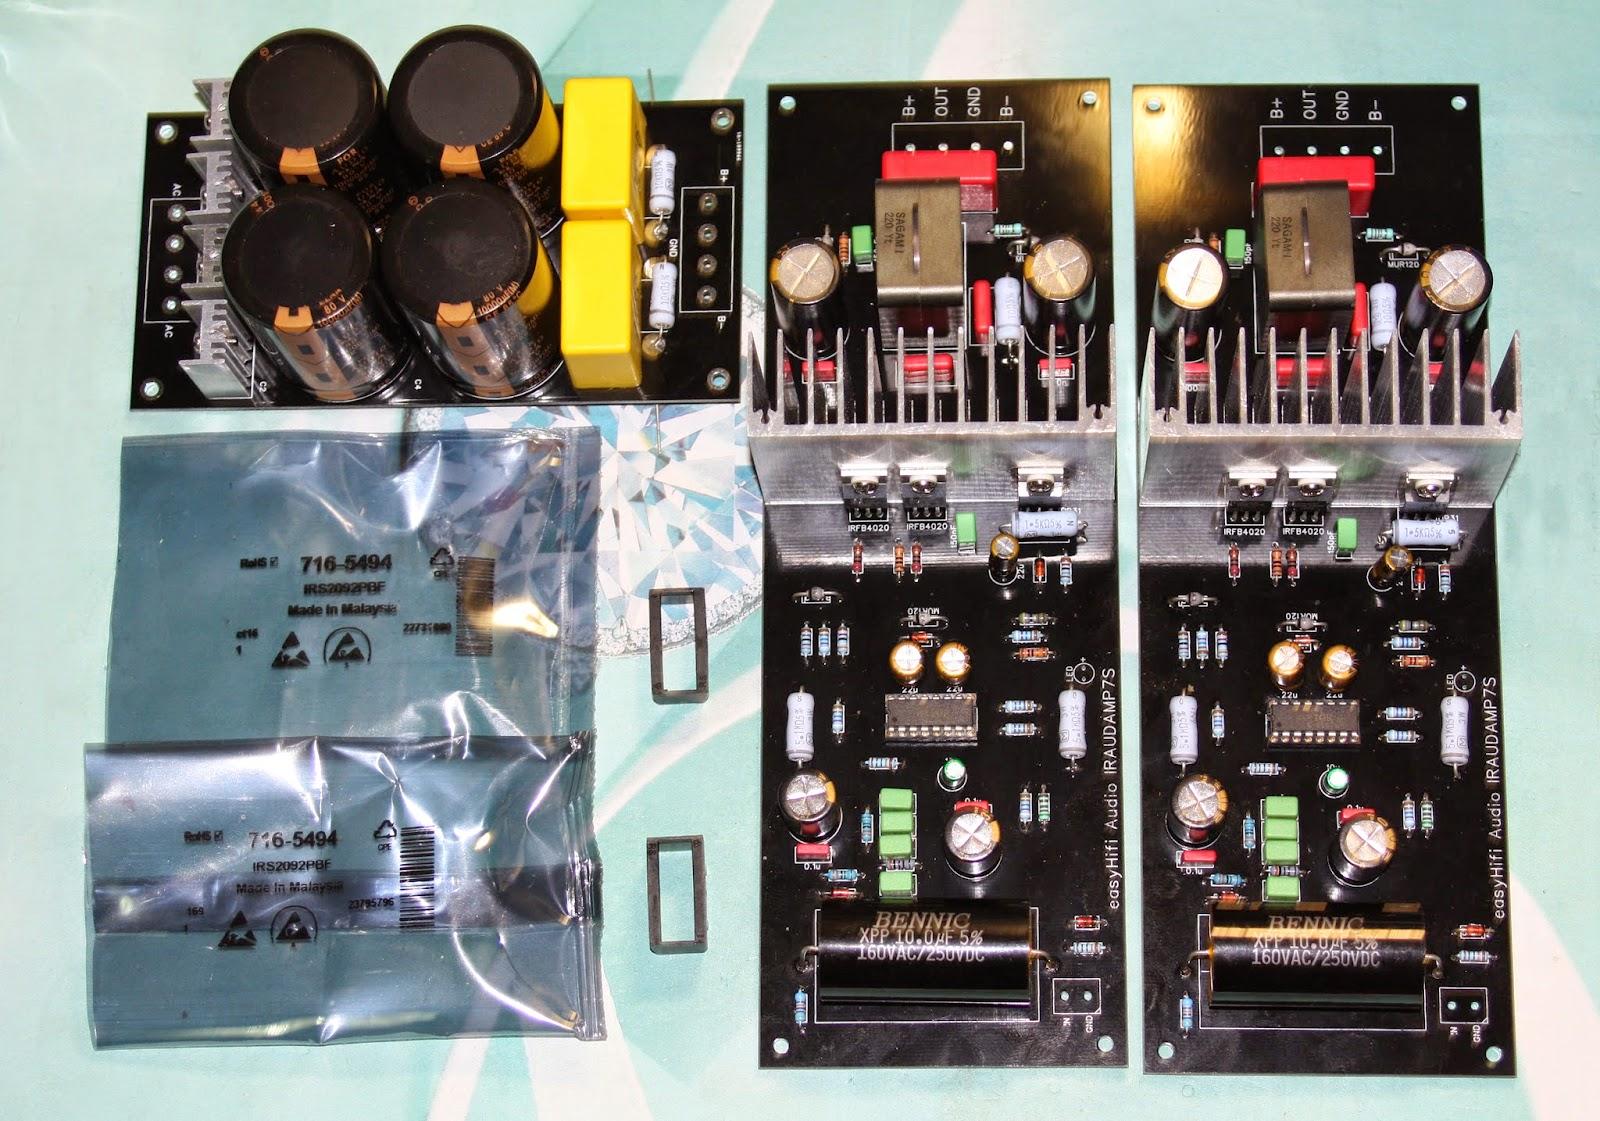 IRS2092 DAMP 裝機報告II | 吉鵬音響工作坊